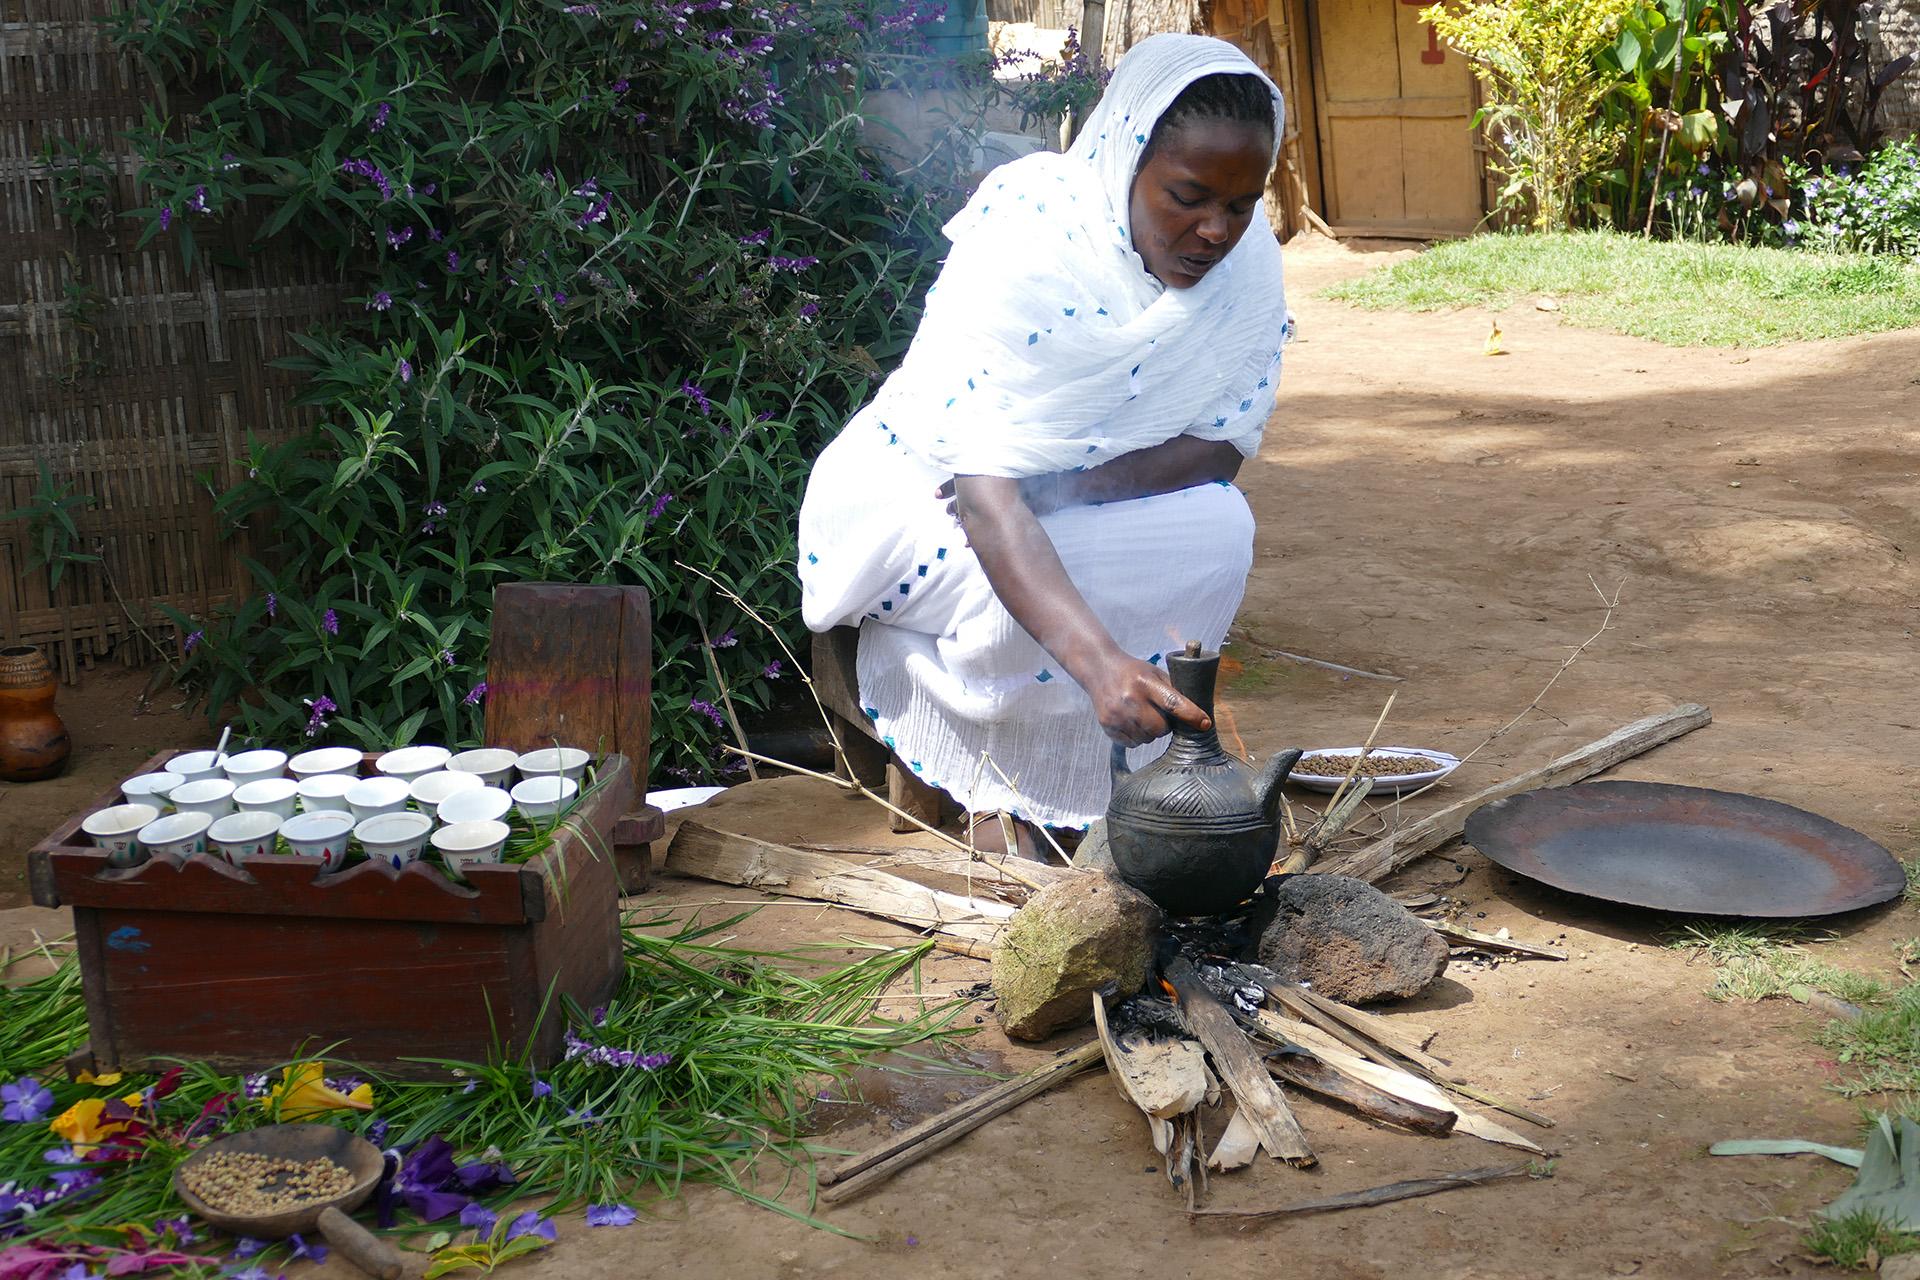 La cerimonia del caffè in Etiopia